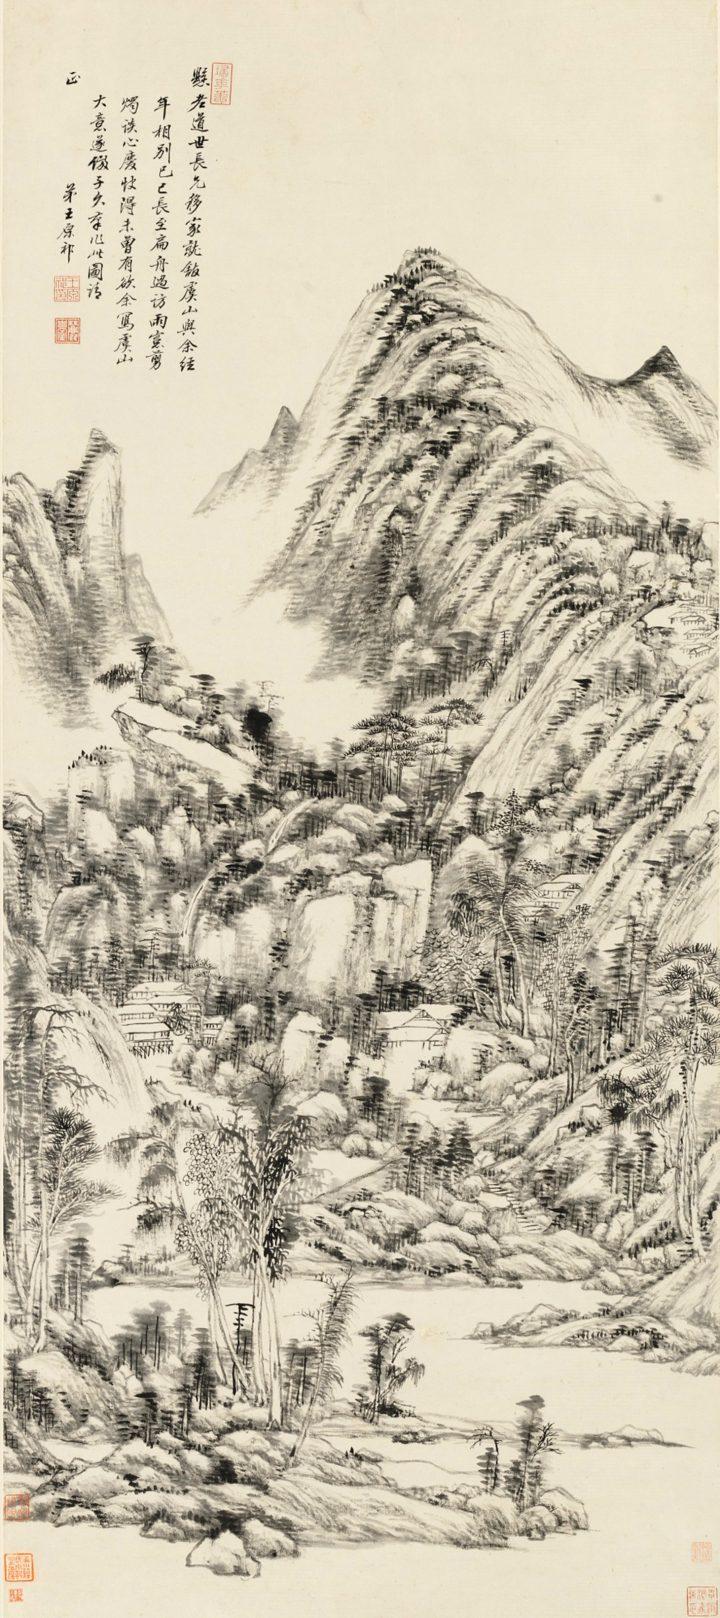 "Wang Yuanqi, ""Landscape of Yushan"" (dated jisi, summer solstice(June 21, 1689)), with three seals of the artist, sao hua an, wang yuan qi yin, lu tai ink on paper, hanging scroll 51 x 22 1/2 inches (image courtesy Sotheby's)"